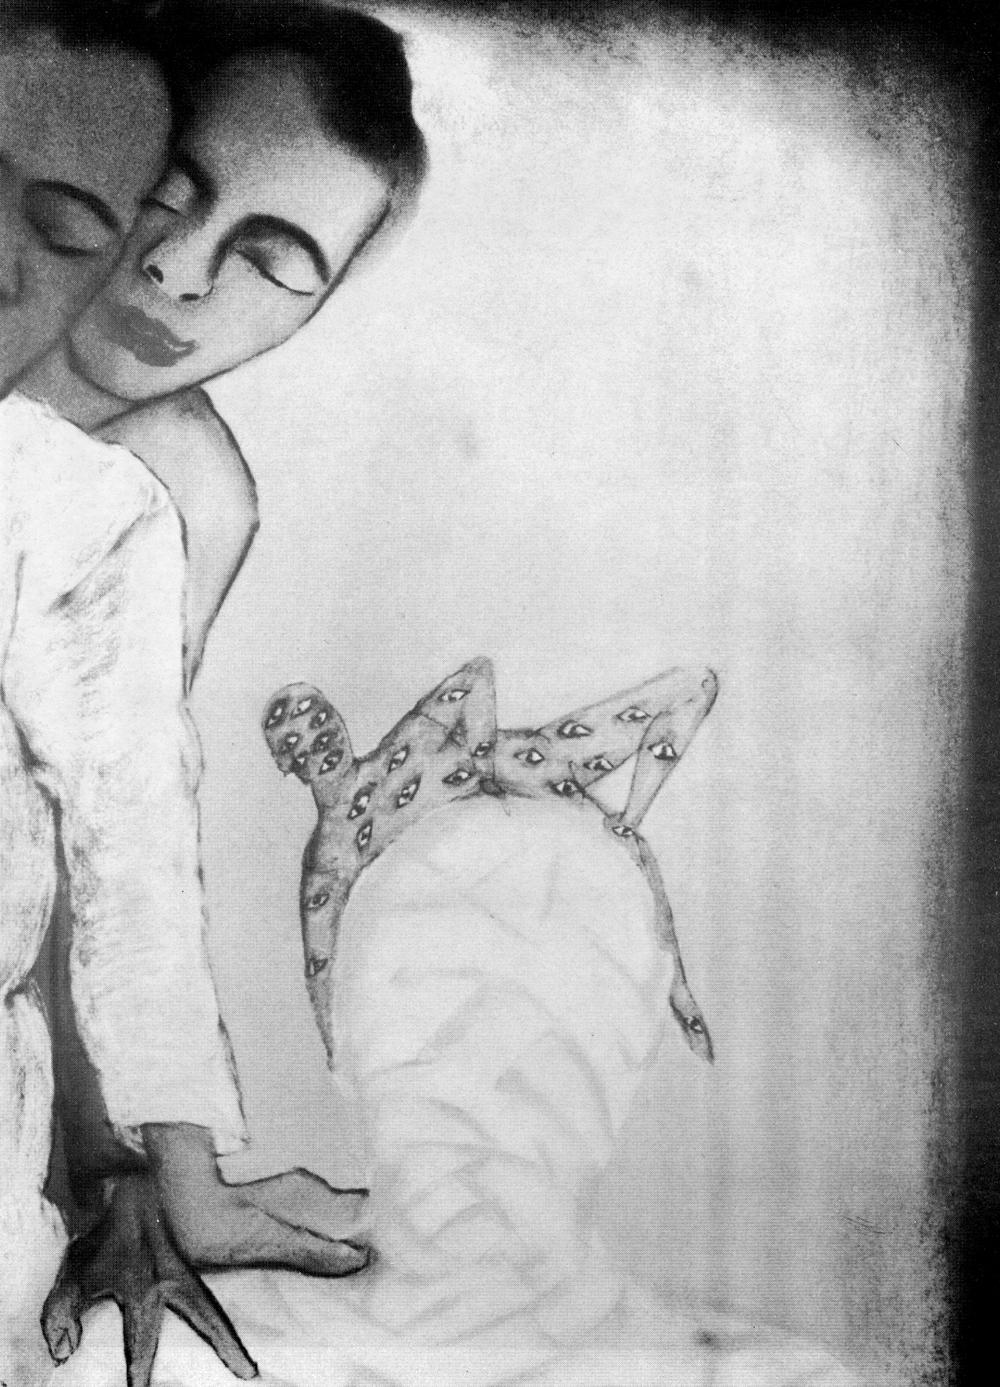 Francesco Clemente Drawings by Francesco Clemente